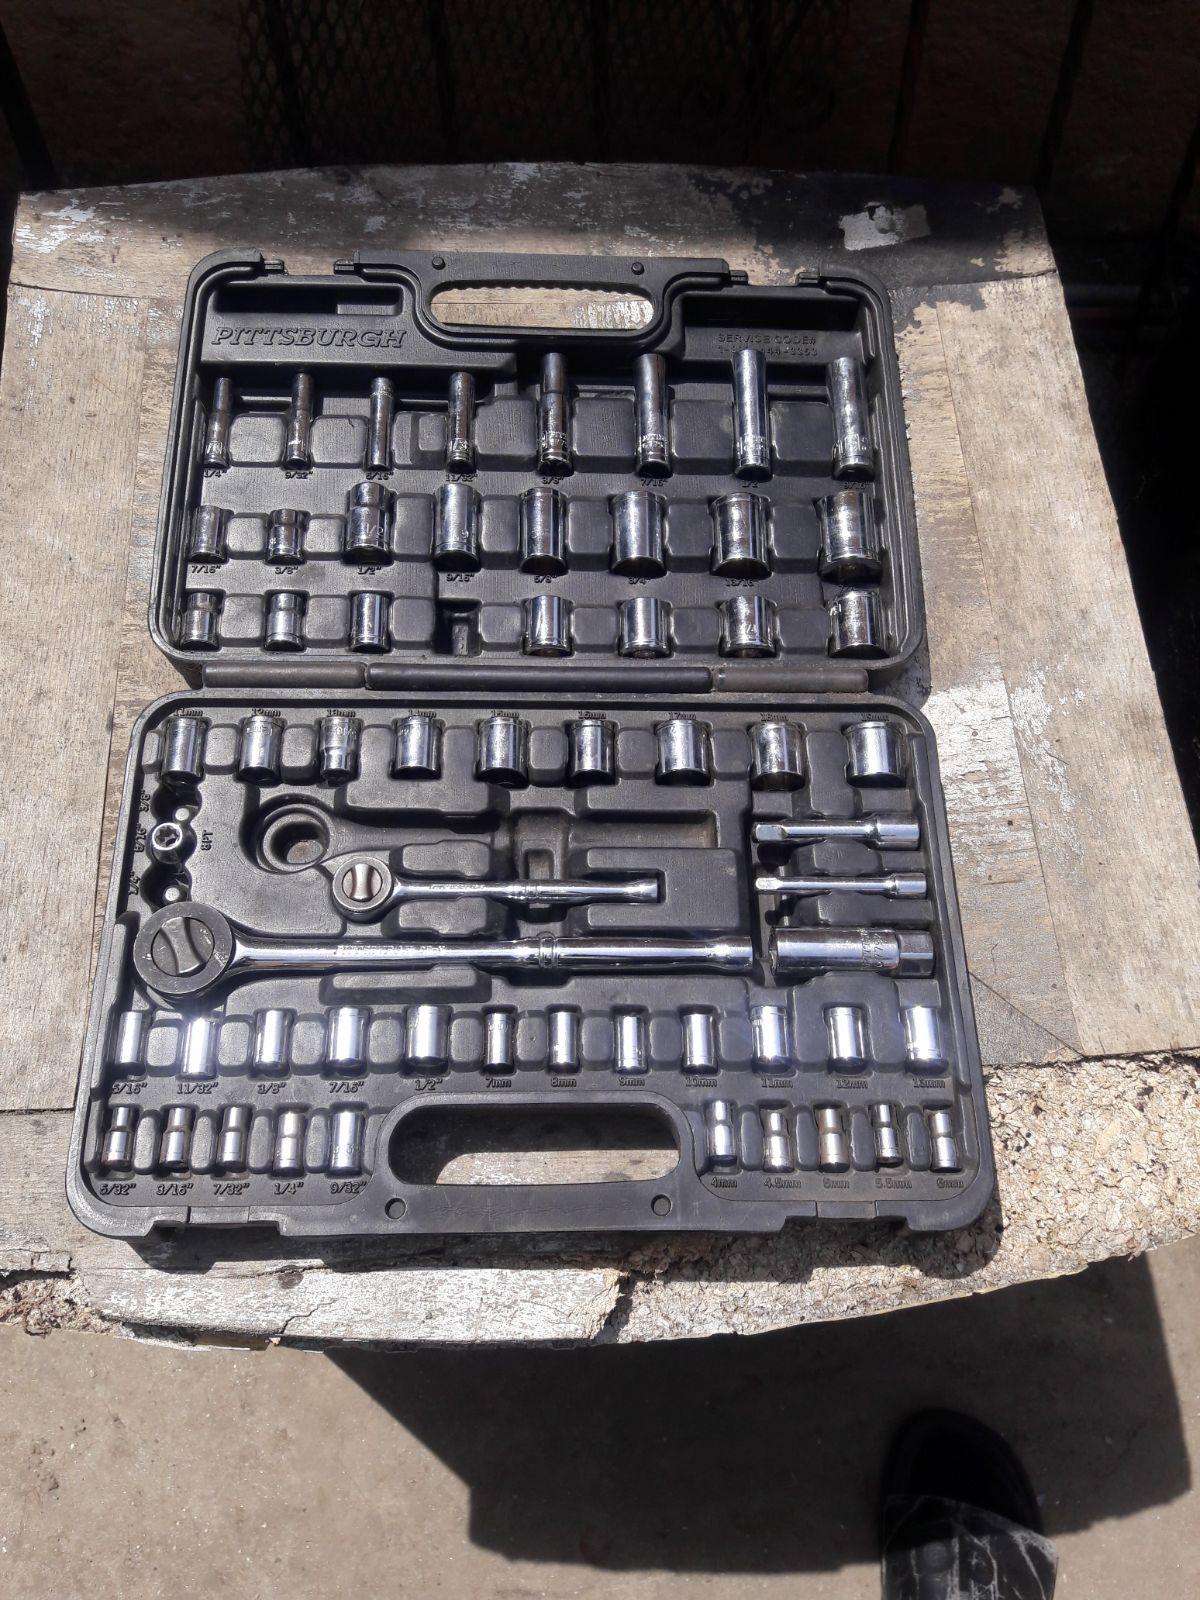 Mechanic Sockets Sets Tools All Sizes With Images Socket Set Craftsman Tools Computer Keyboard